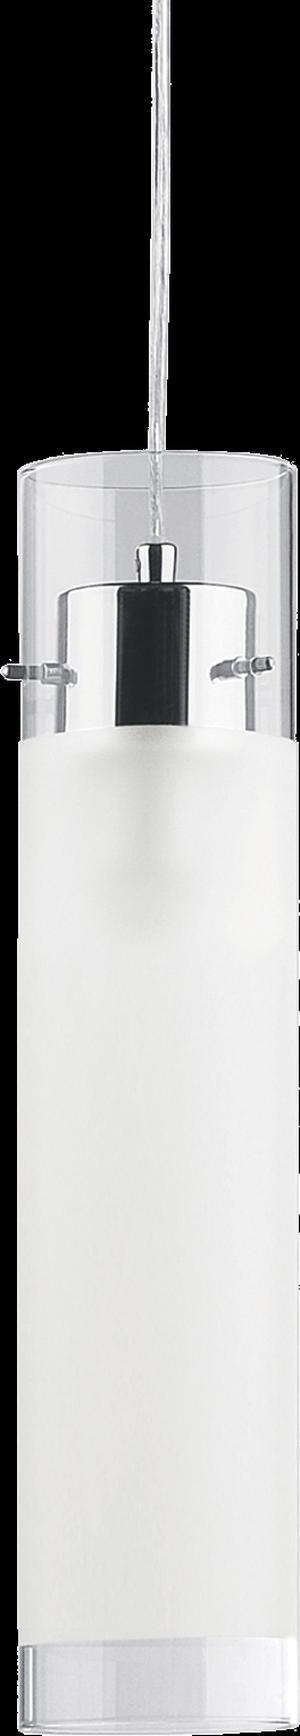 Ideal lux LED Flam big haengende Lampe 5W 27364